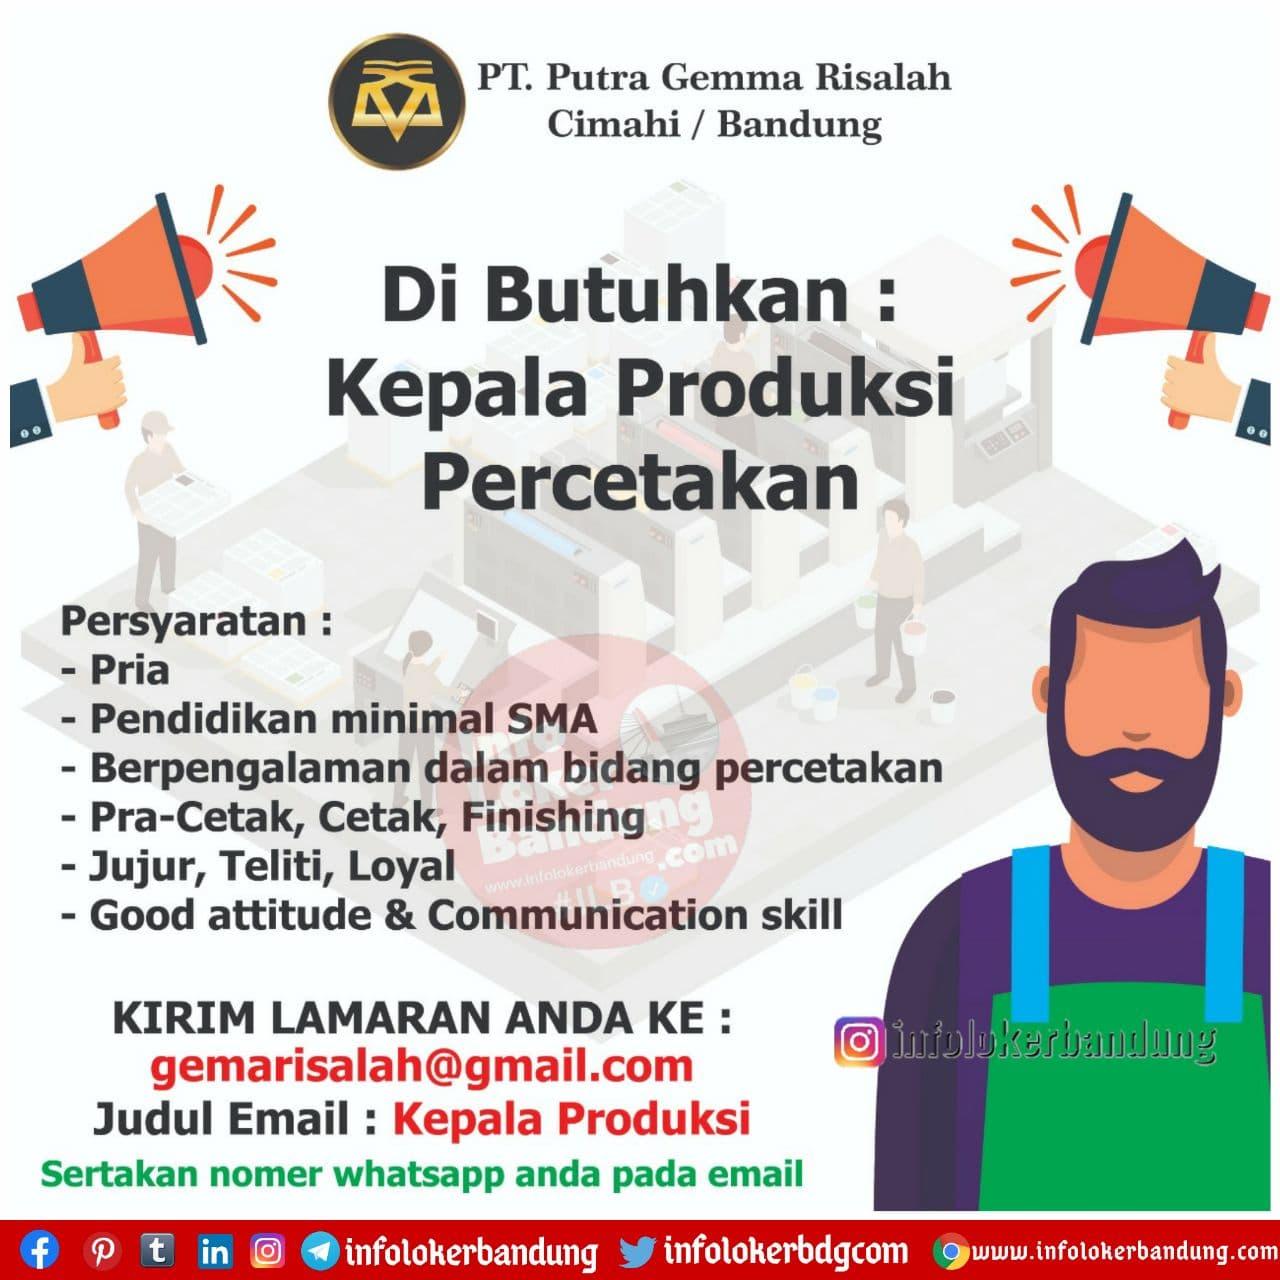 Lowongan Kerja PT. Putra Gemma Risalah Bandung Desember 2020